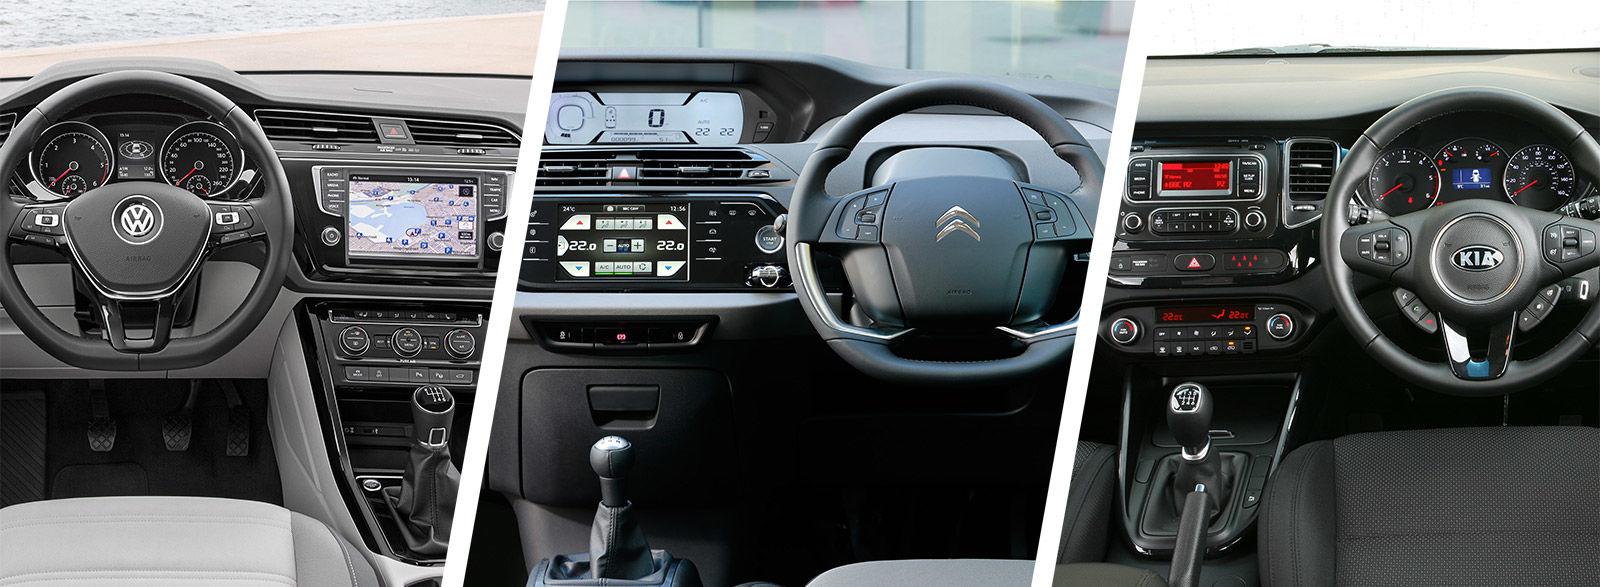 VW Touran, Citroen Grand C4 Picasso & Kia Carens video test   carwow